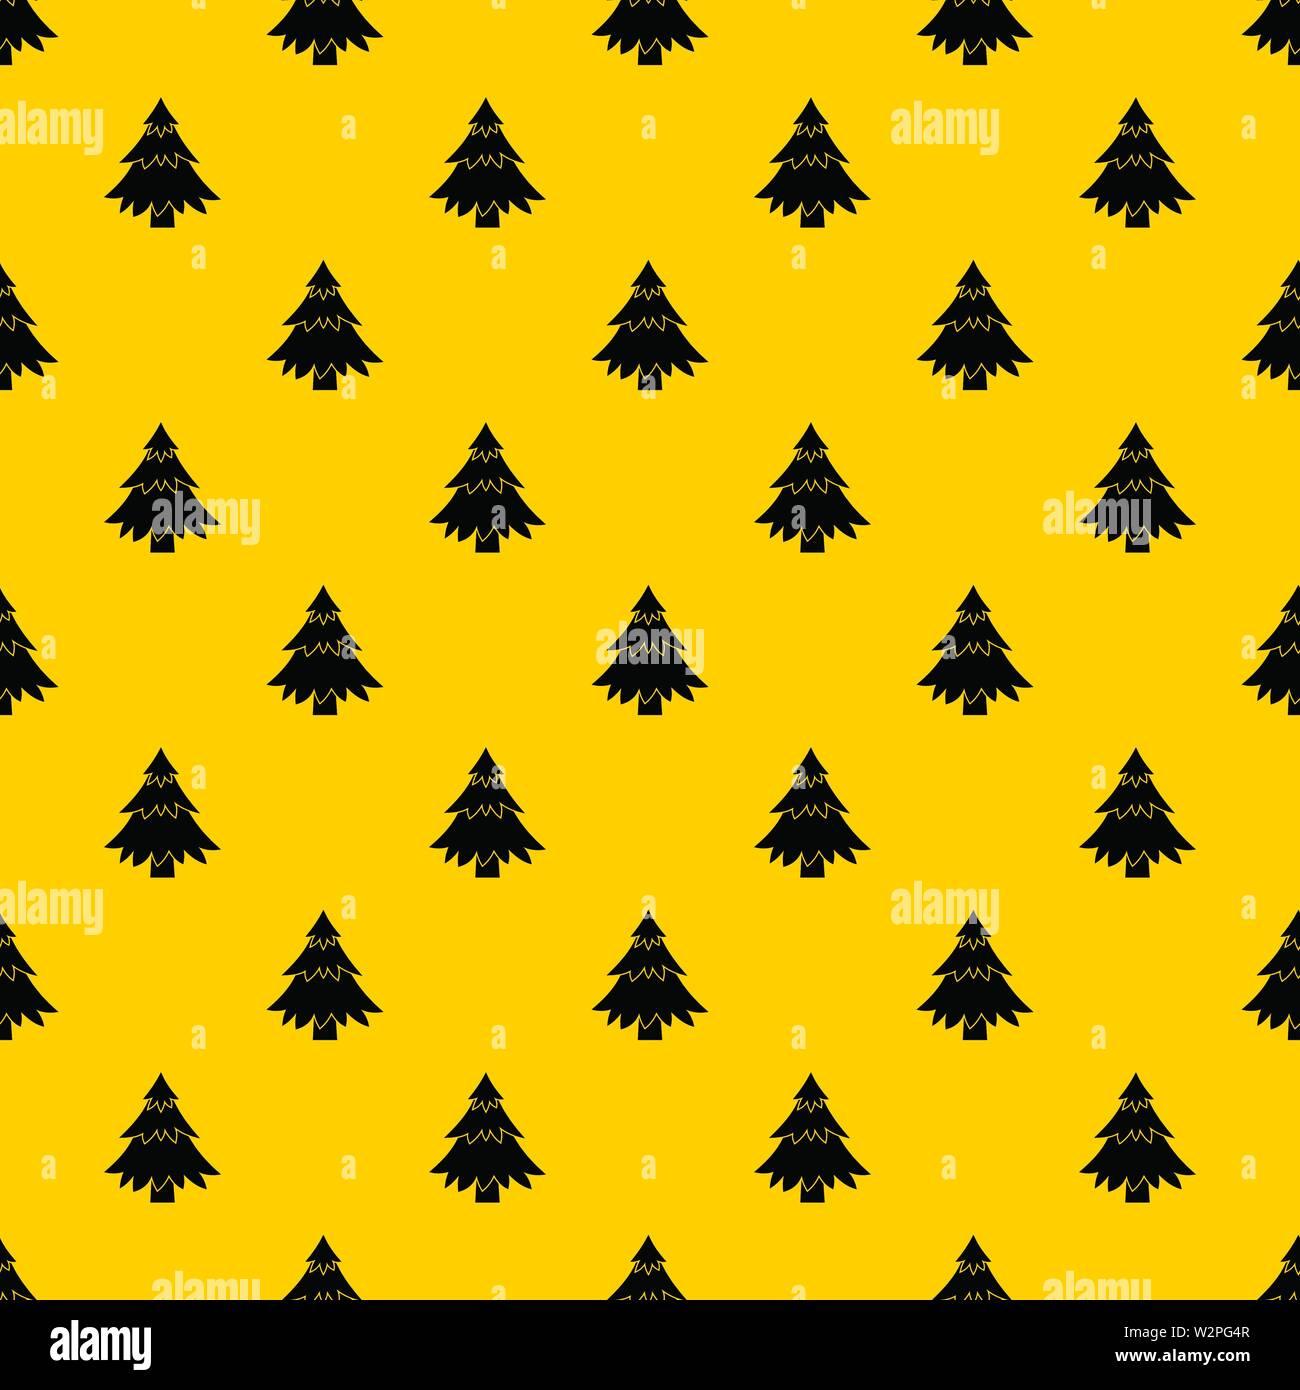 Coniferous tree pattern vector - Stock Image